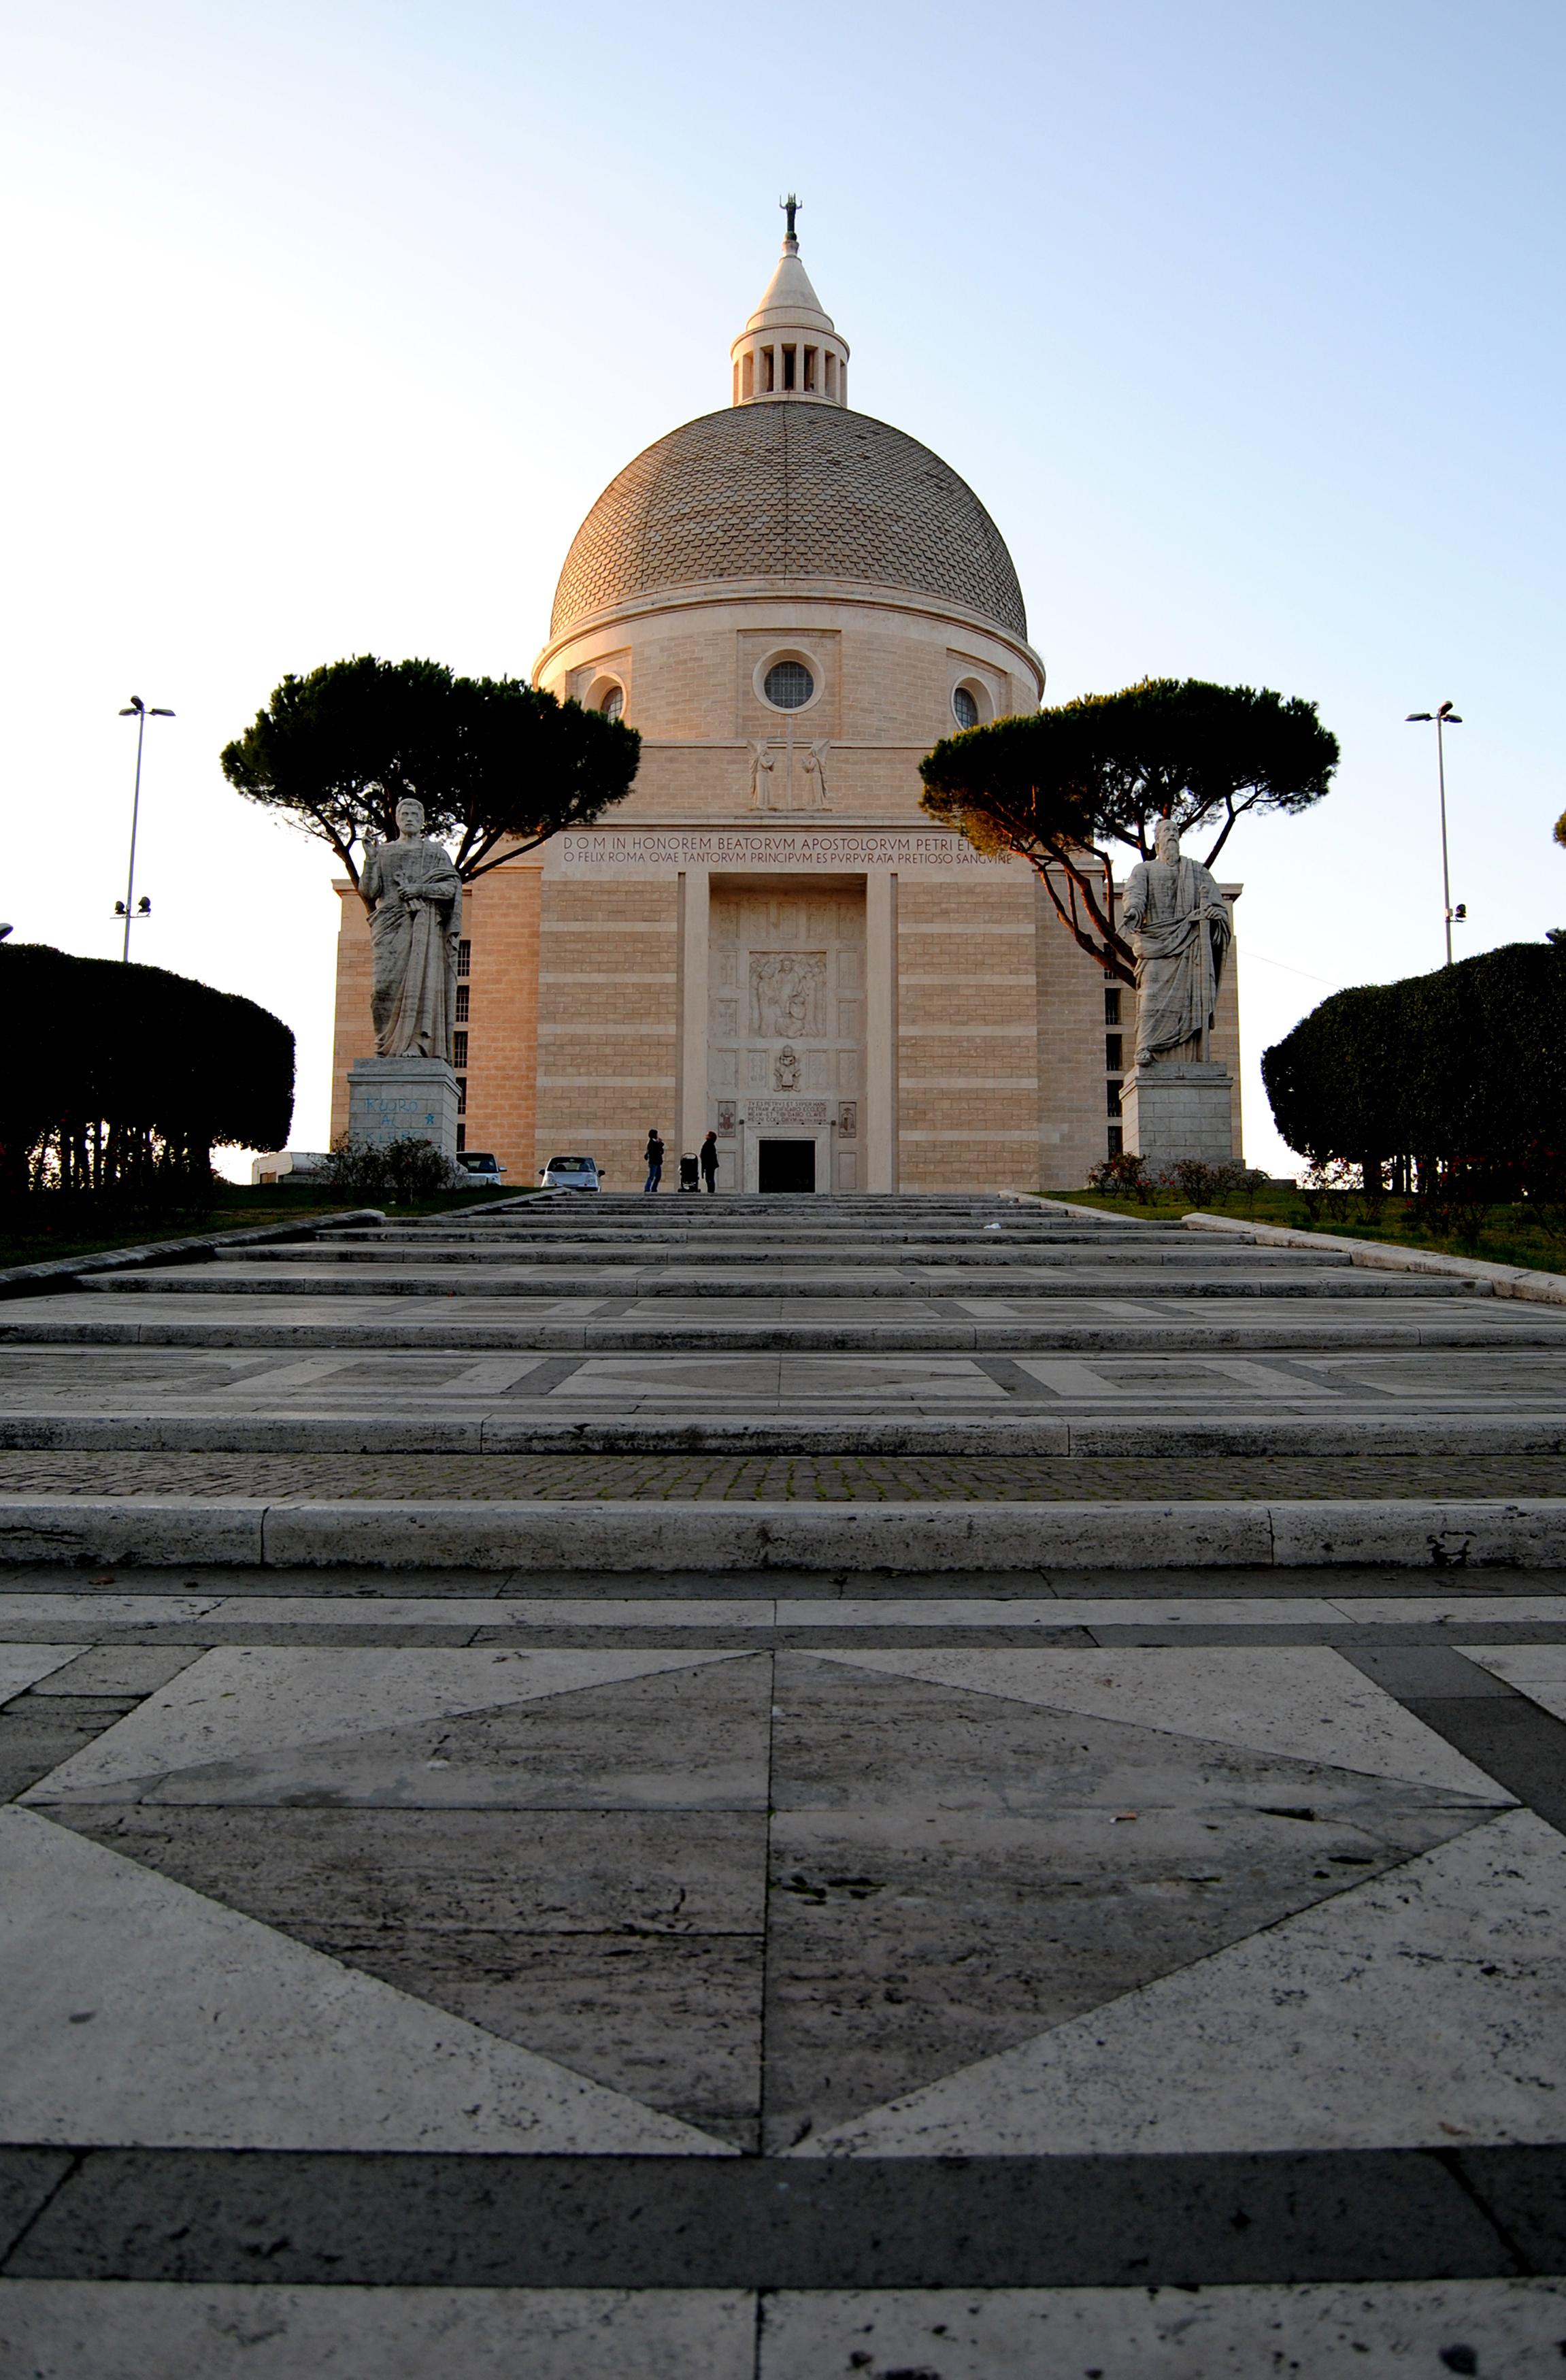 File:Basilica di San Pietro e Paolo - EUR - panoramio.jpg - Wikimedia  Commons